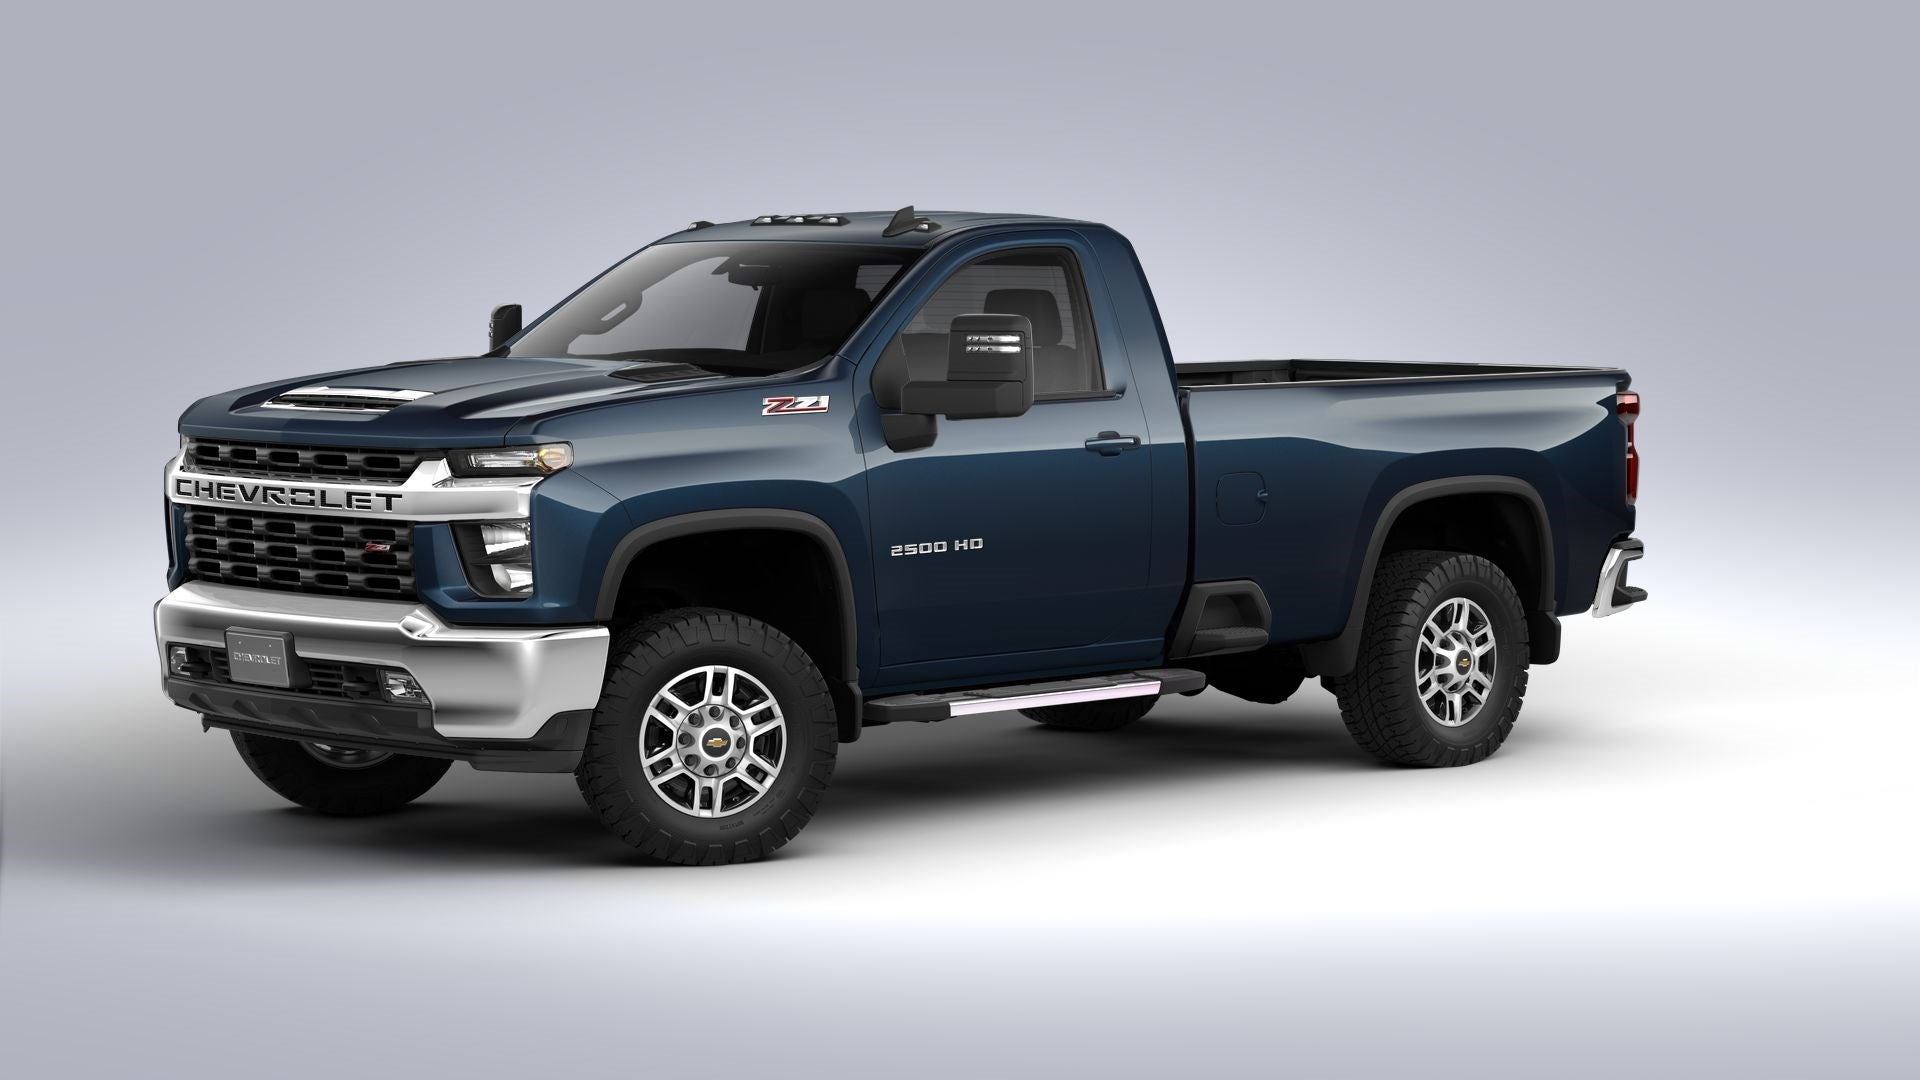 2022 Chevrolet Silverado Neillsville WI